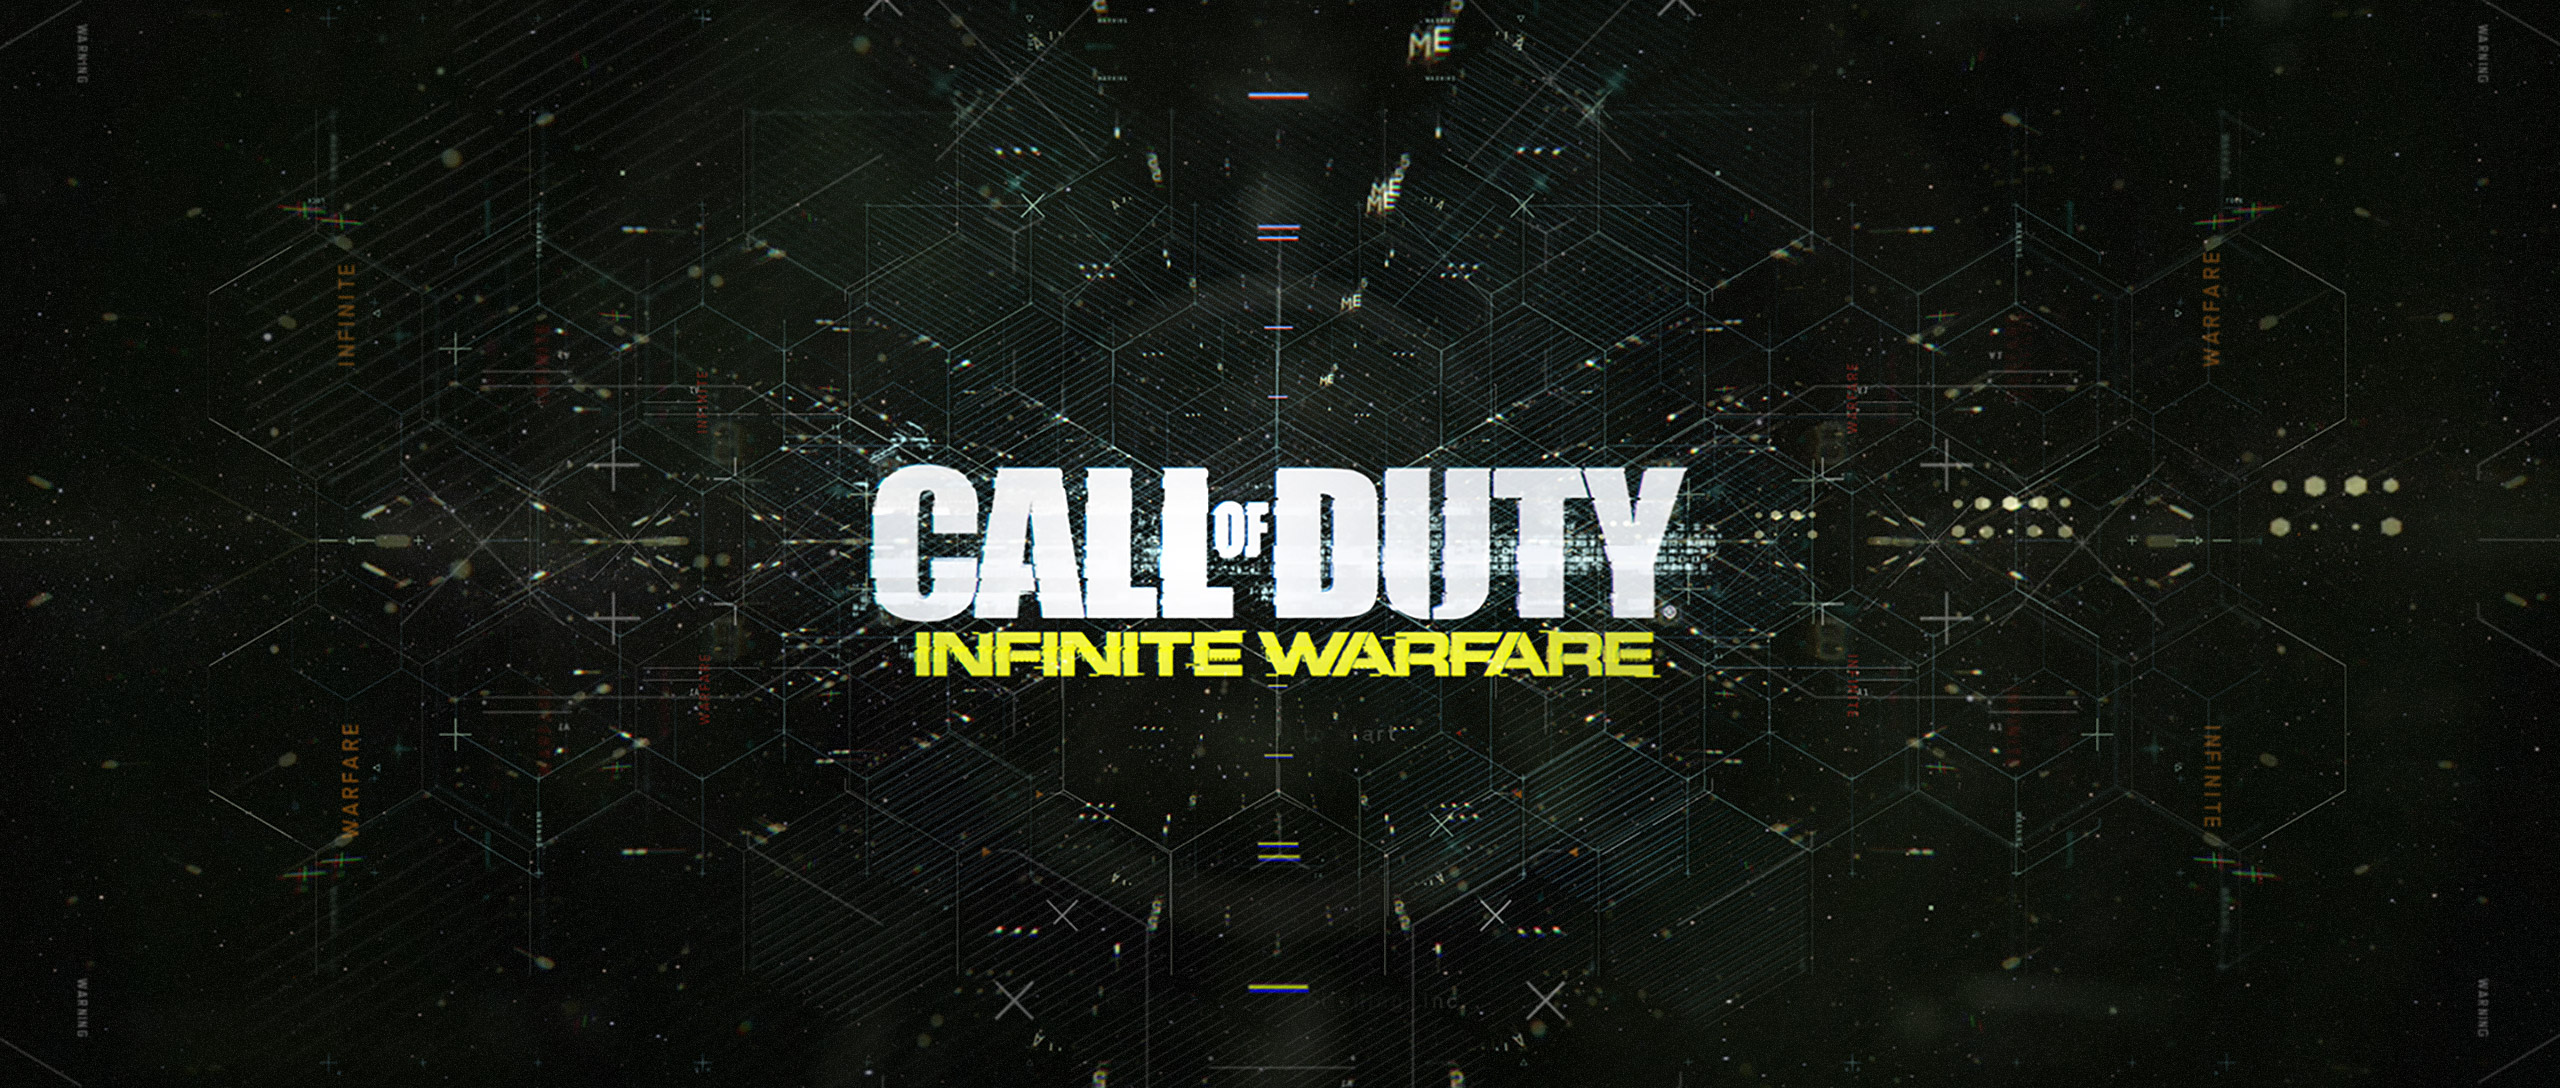 Call of Duty: Infinite Warfare.